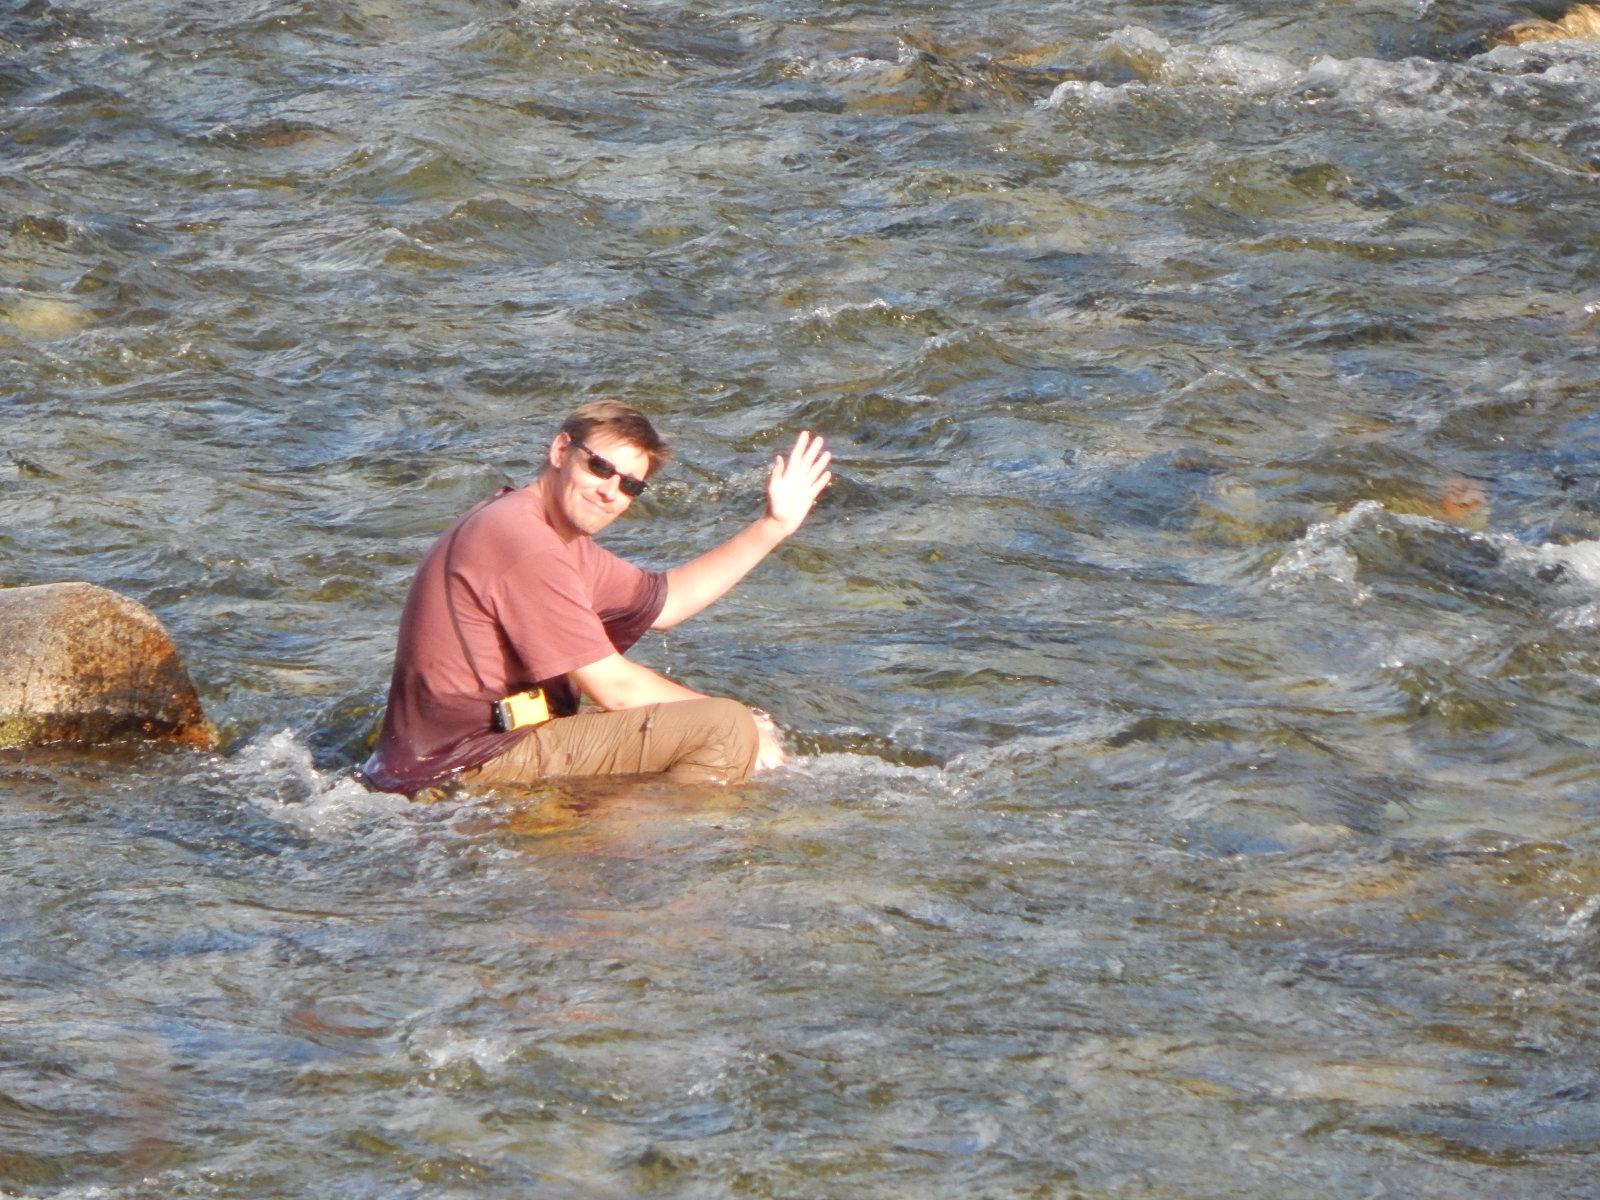 river_wave.JPG